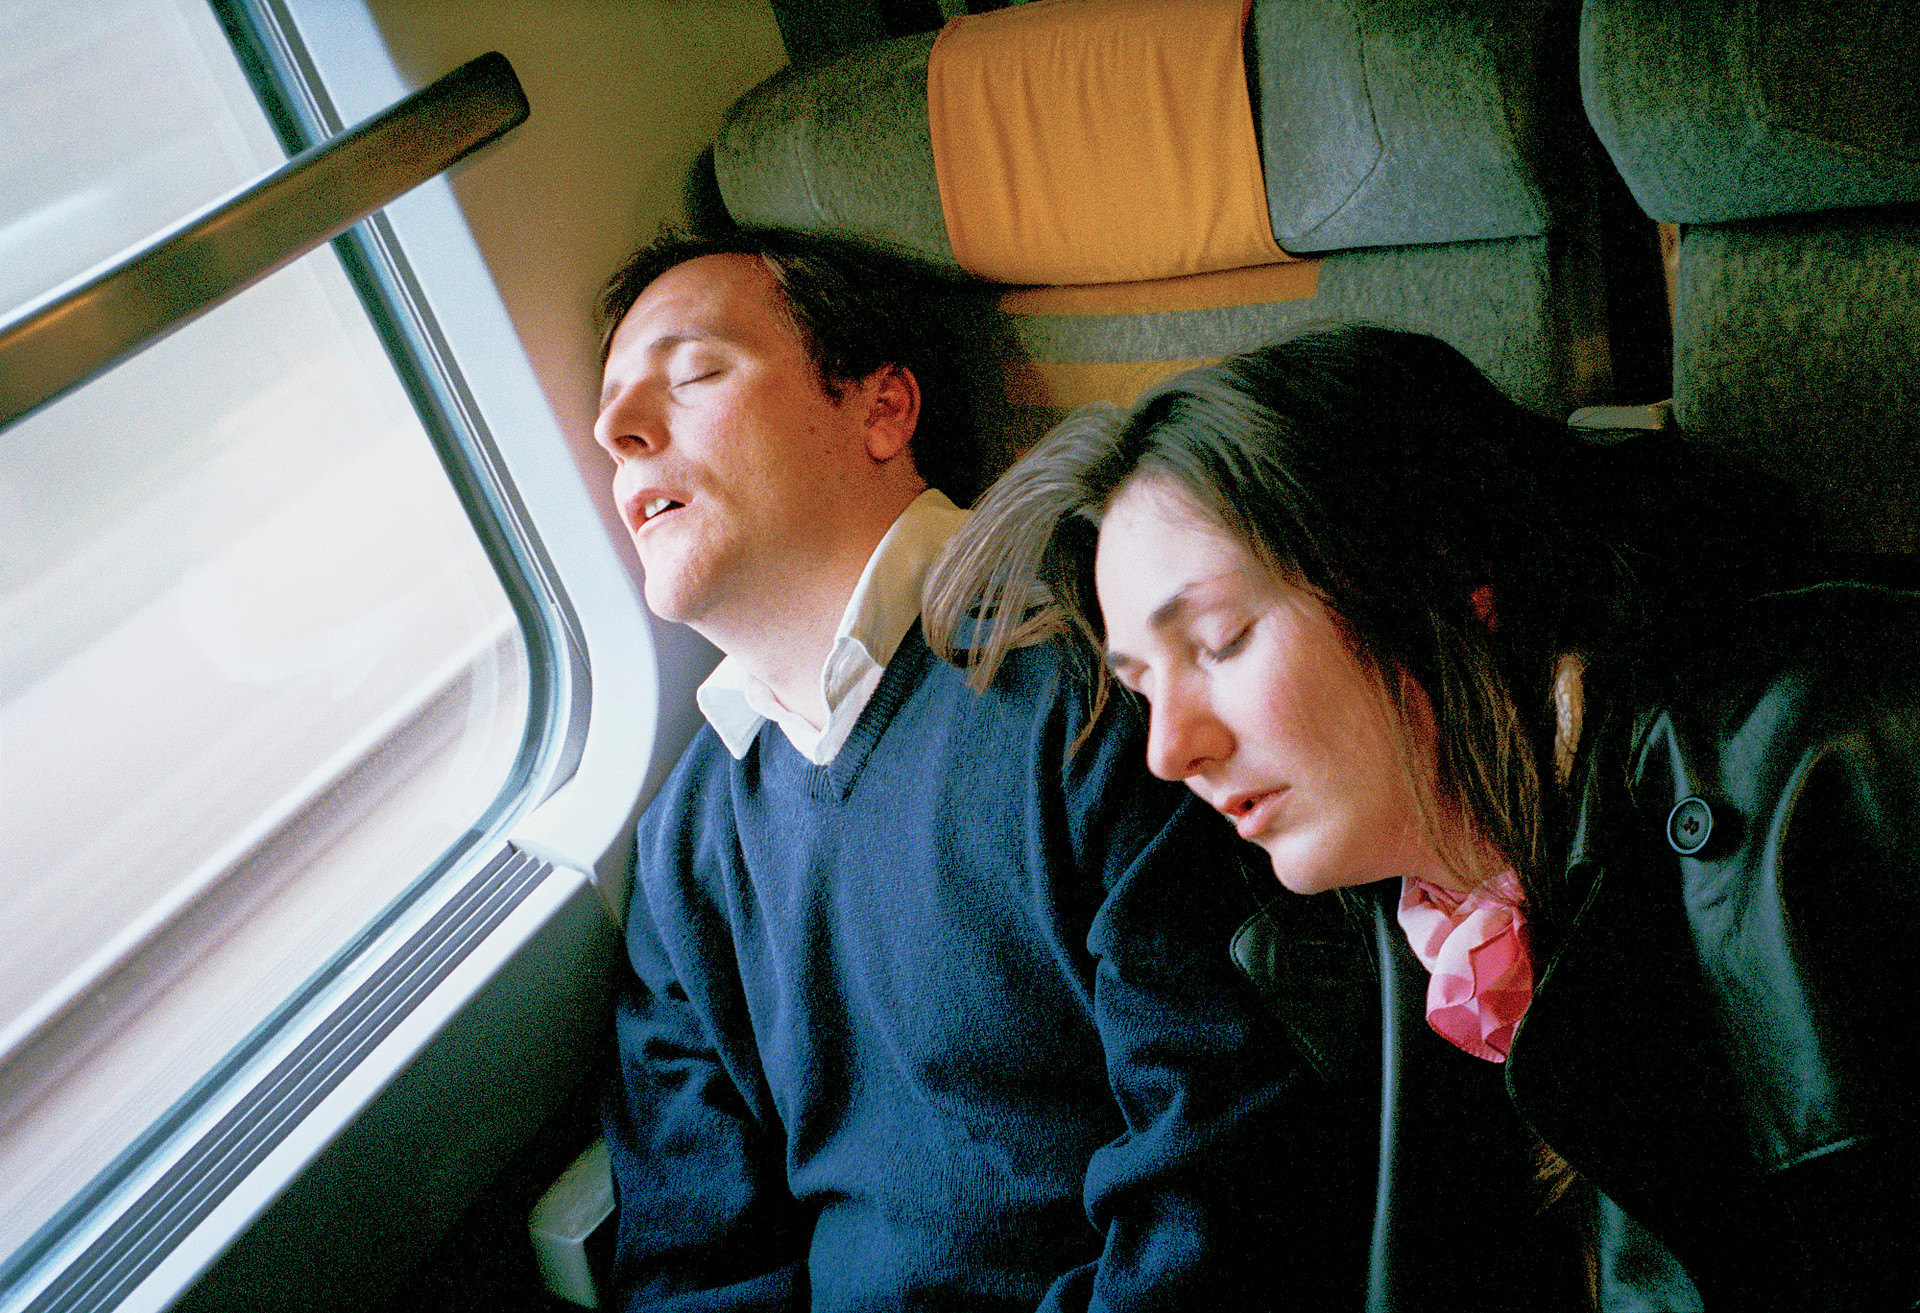 eurostar sleepers #2